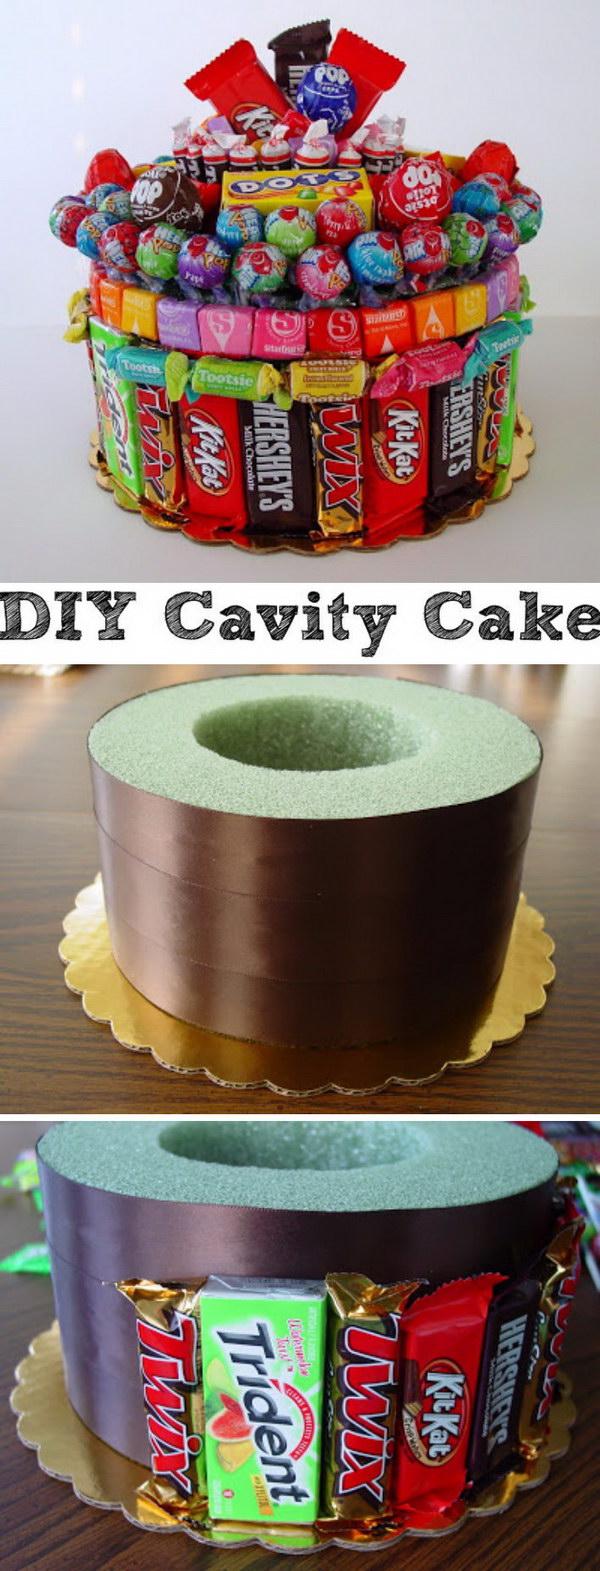 DIY Cavity Cake.